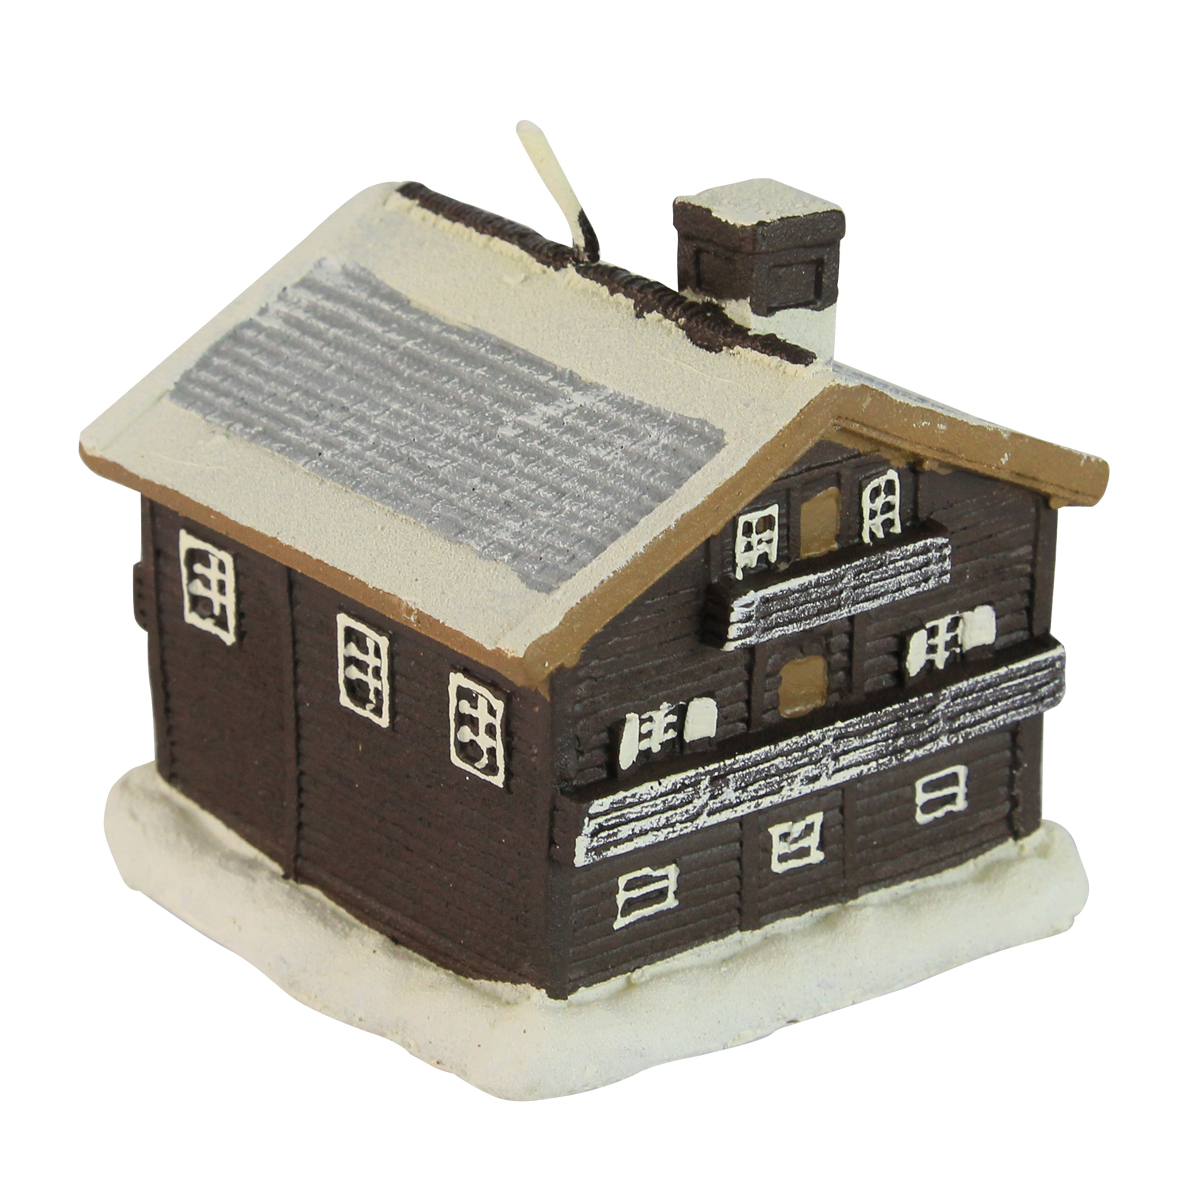 Lumanare Decorativa Casa 8 Cm